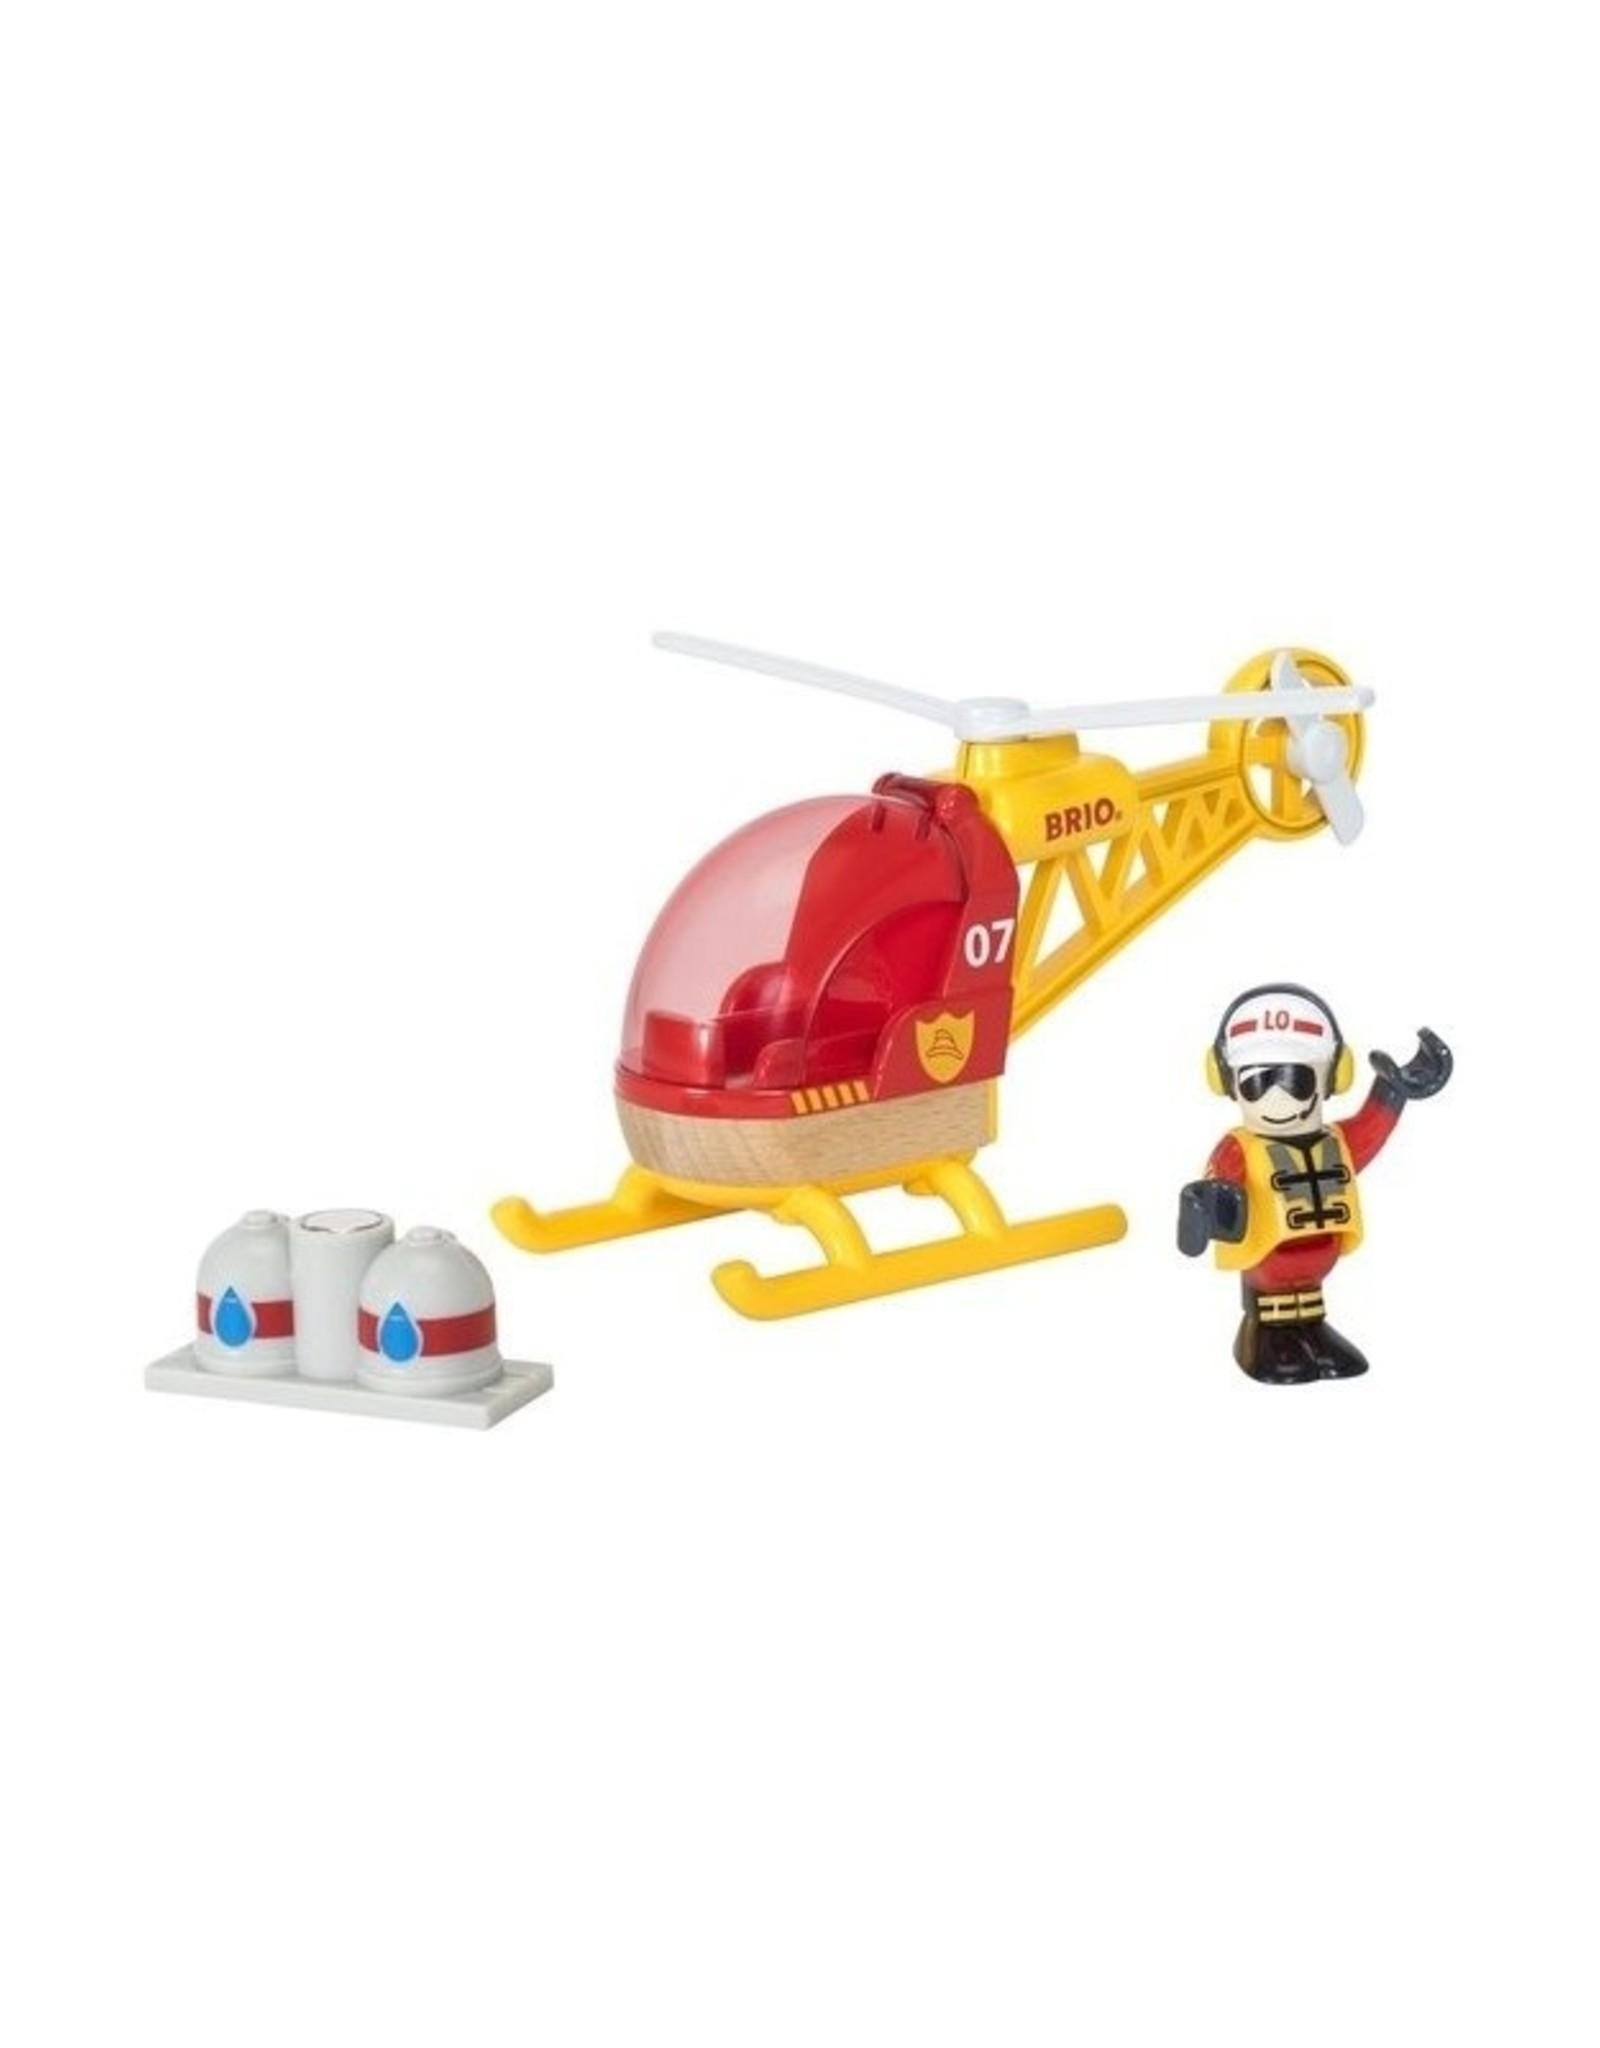 Brio BRIO - Firefighter Helicopter